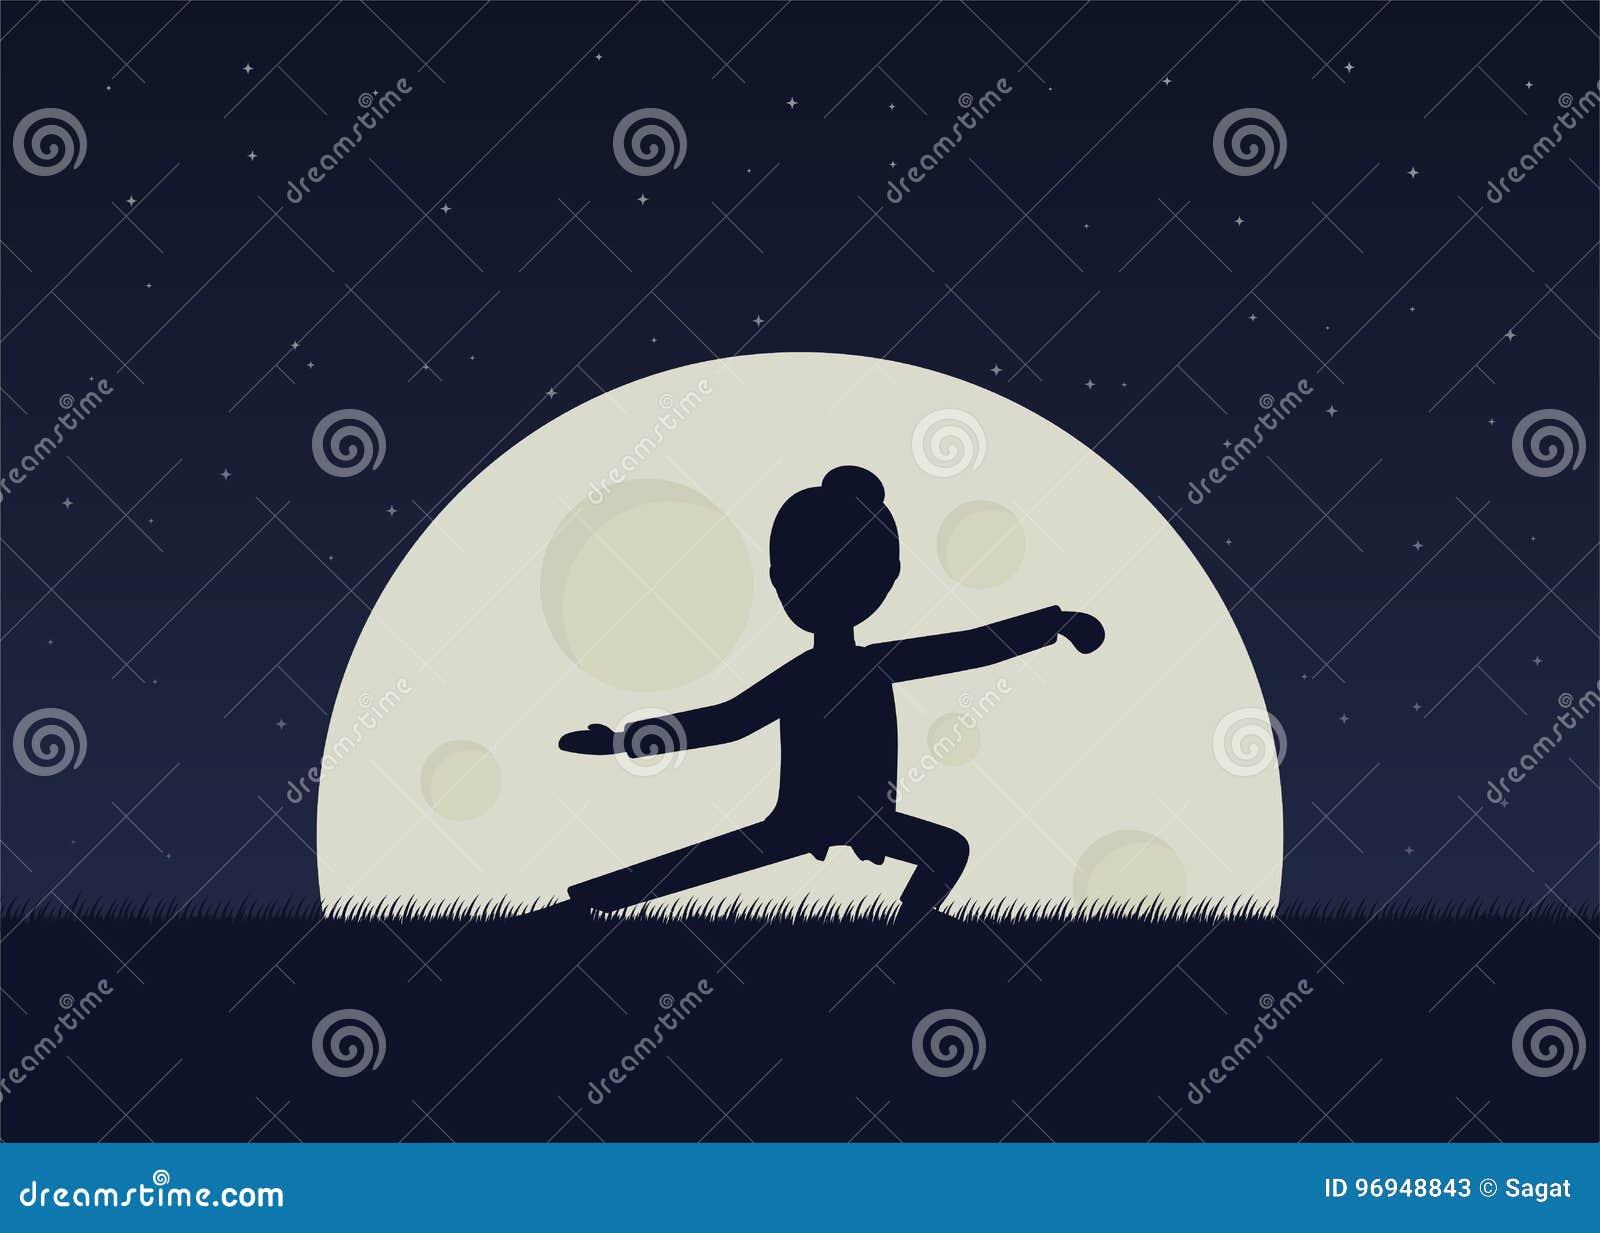 Mädchen Ausführungsqigong oder taijiquan Übungen am Abend